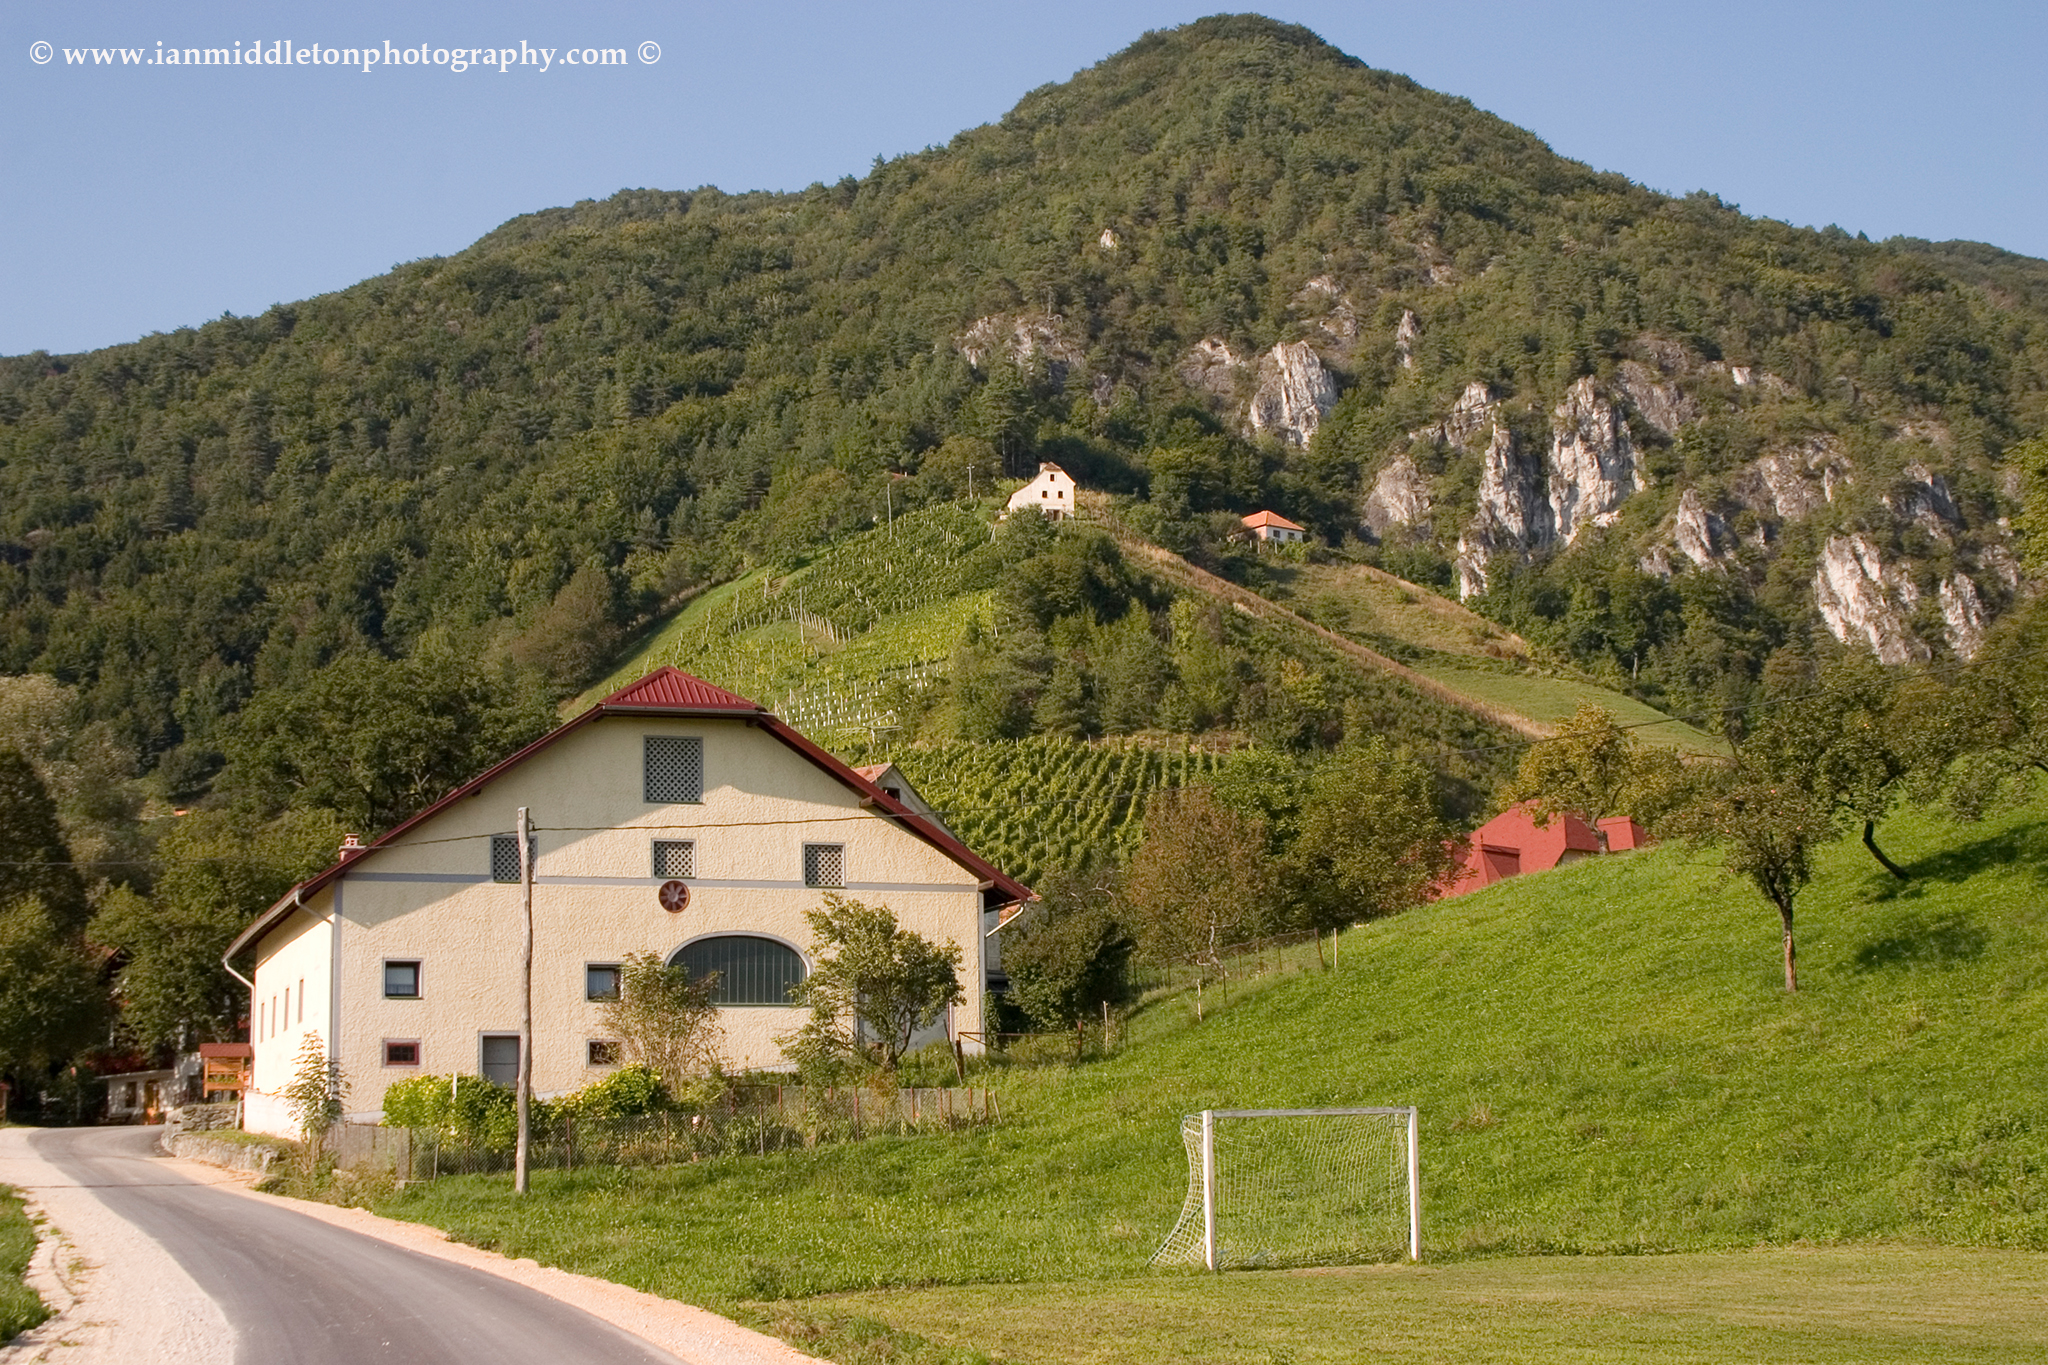 Zgorni Gabernik village with Boc hill behind.